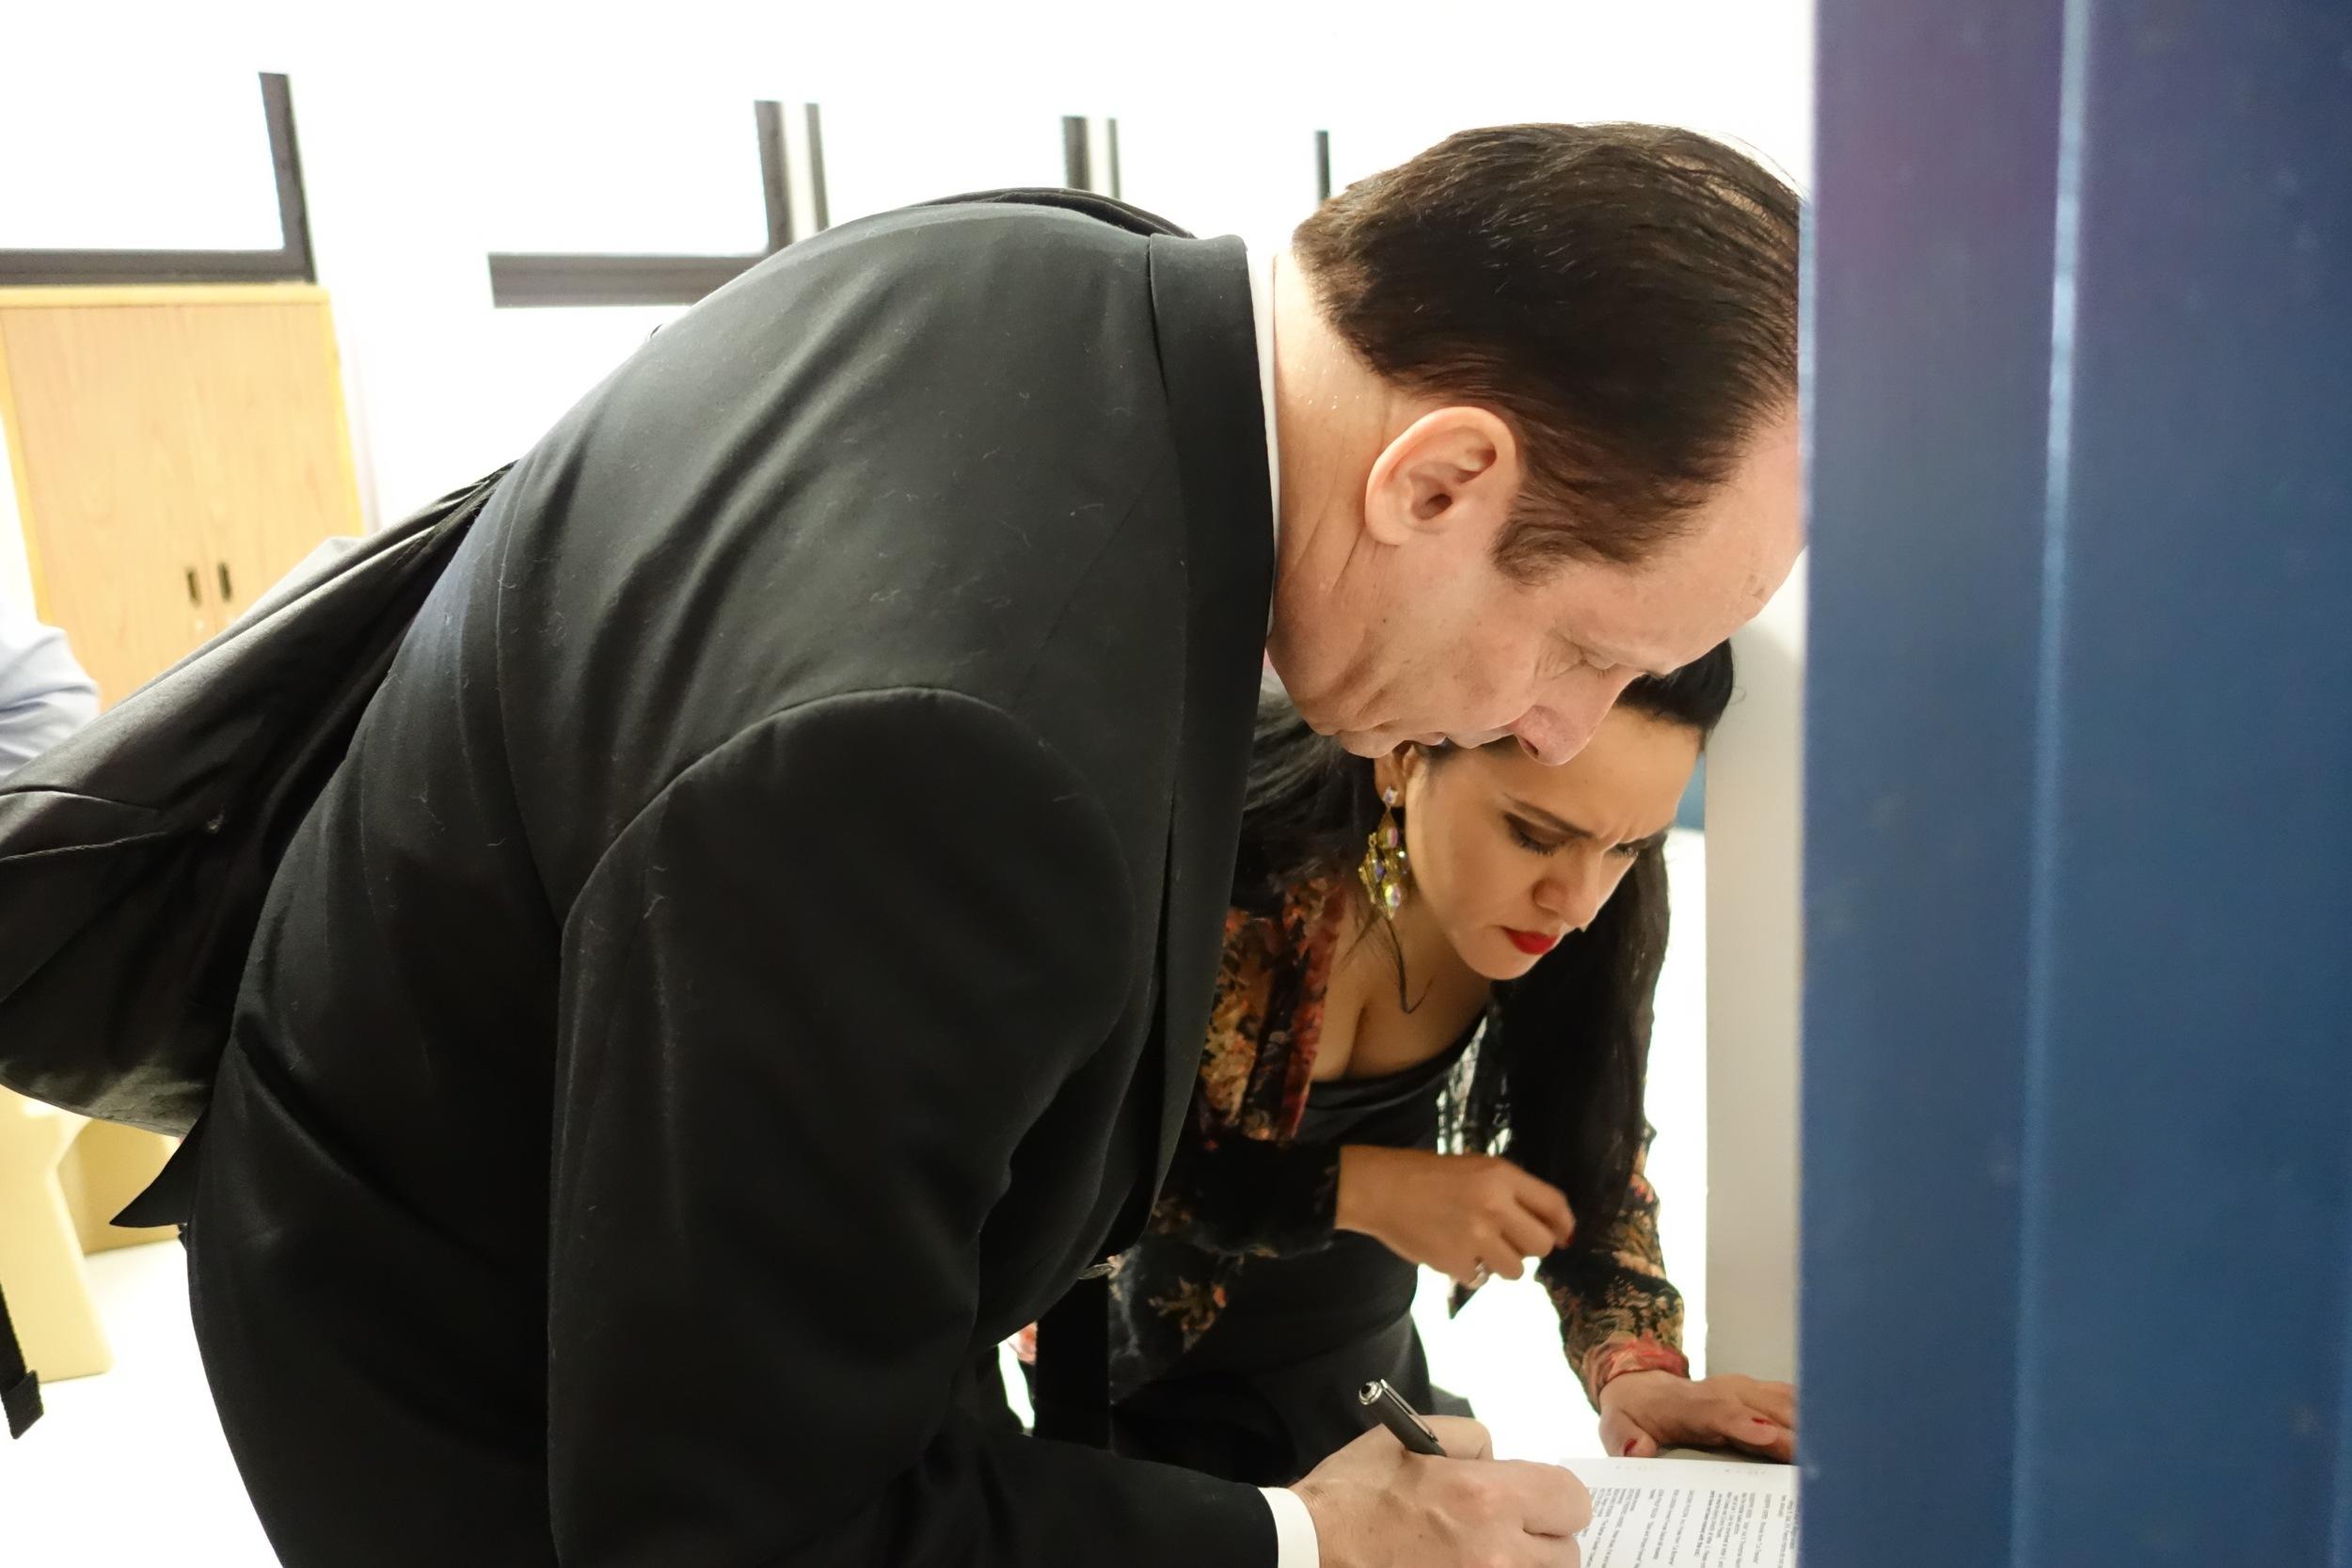 Event organizer David Langlitz confers with soprano Gizel Rodríguez.